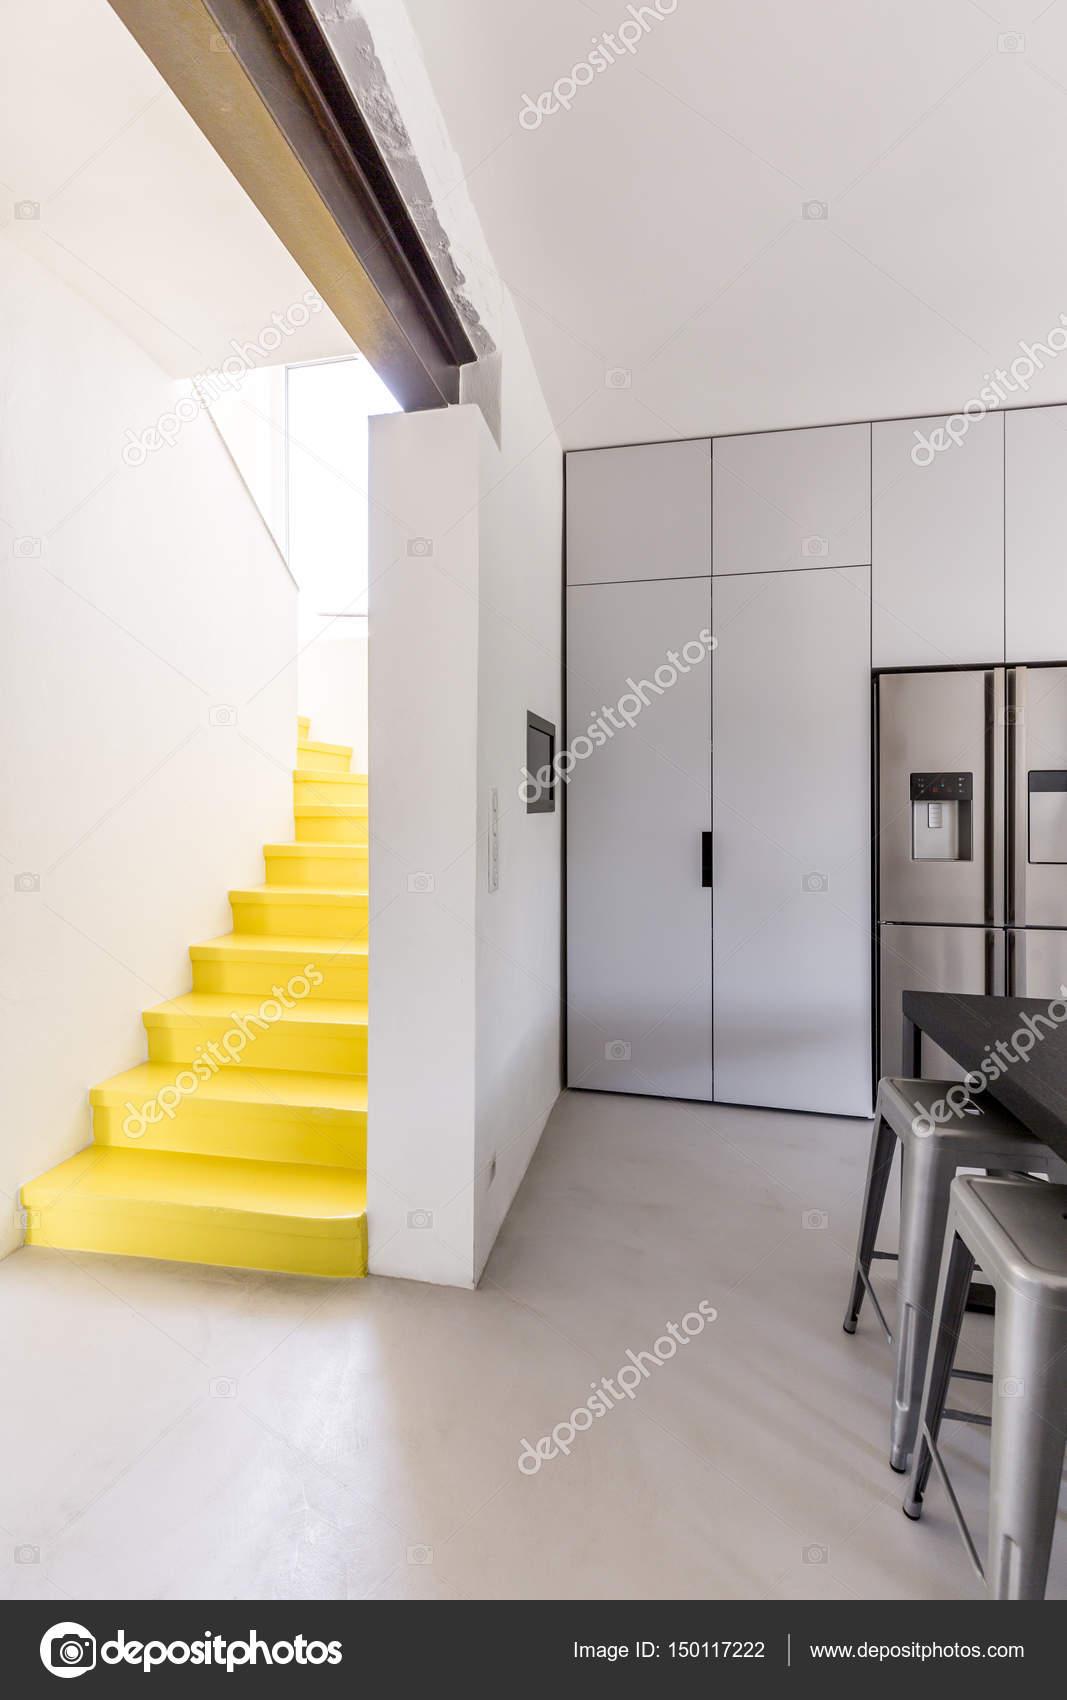 Escalier moderne en jaune — Photographie photographee.eu ...